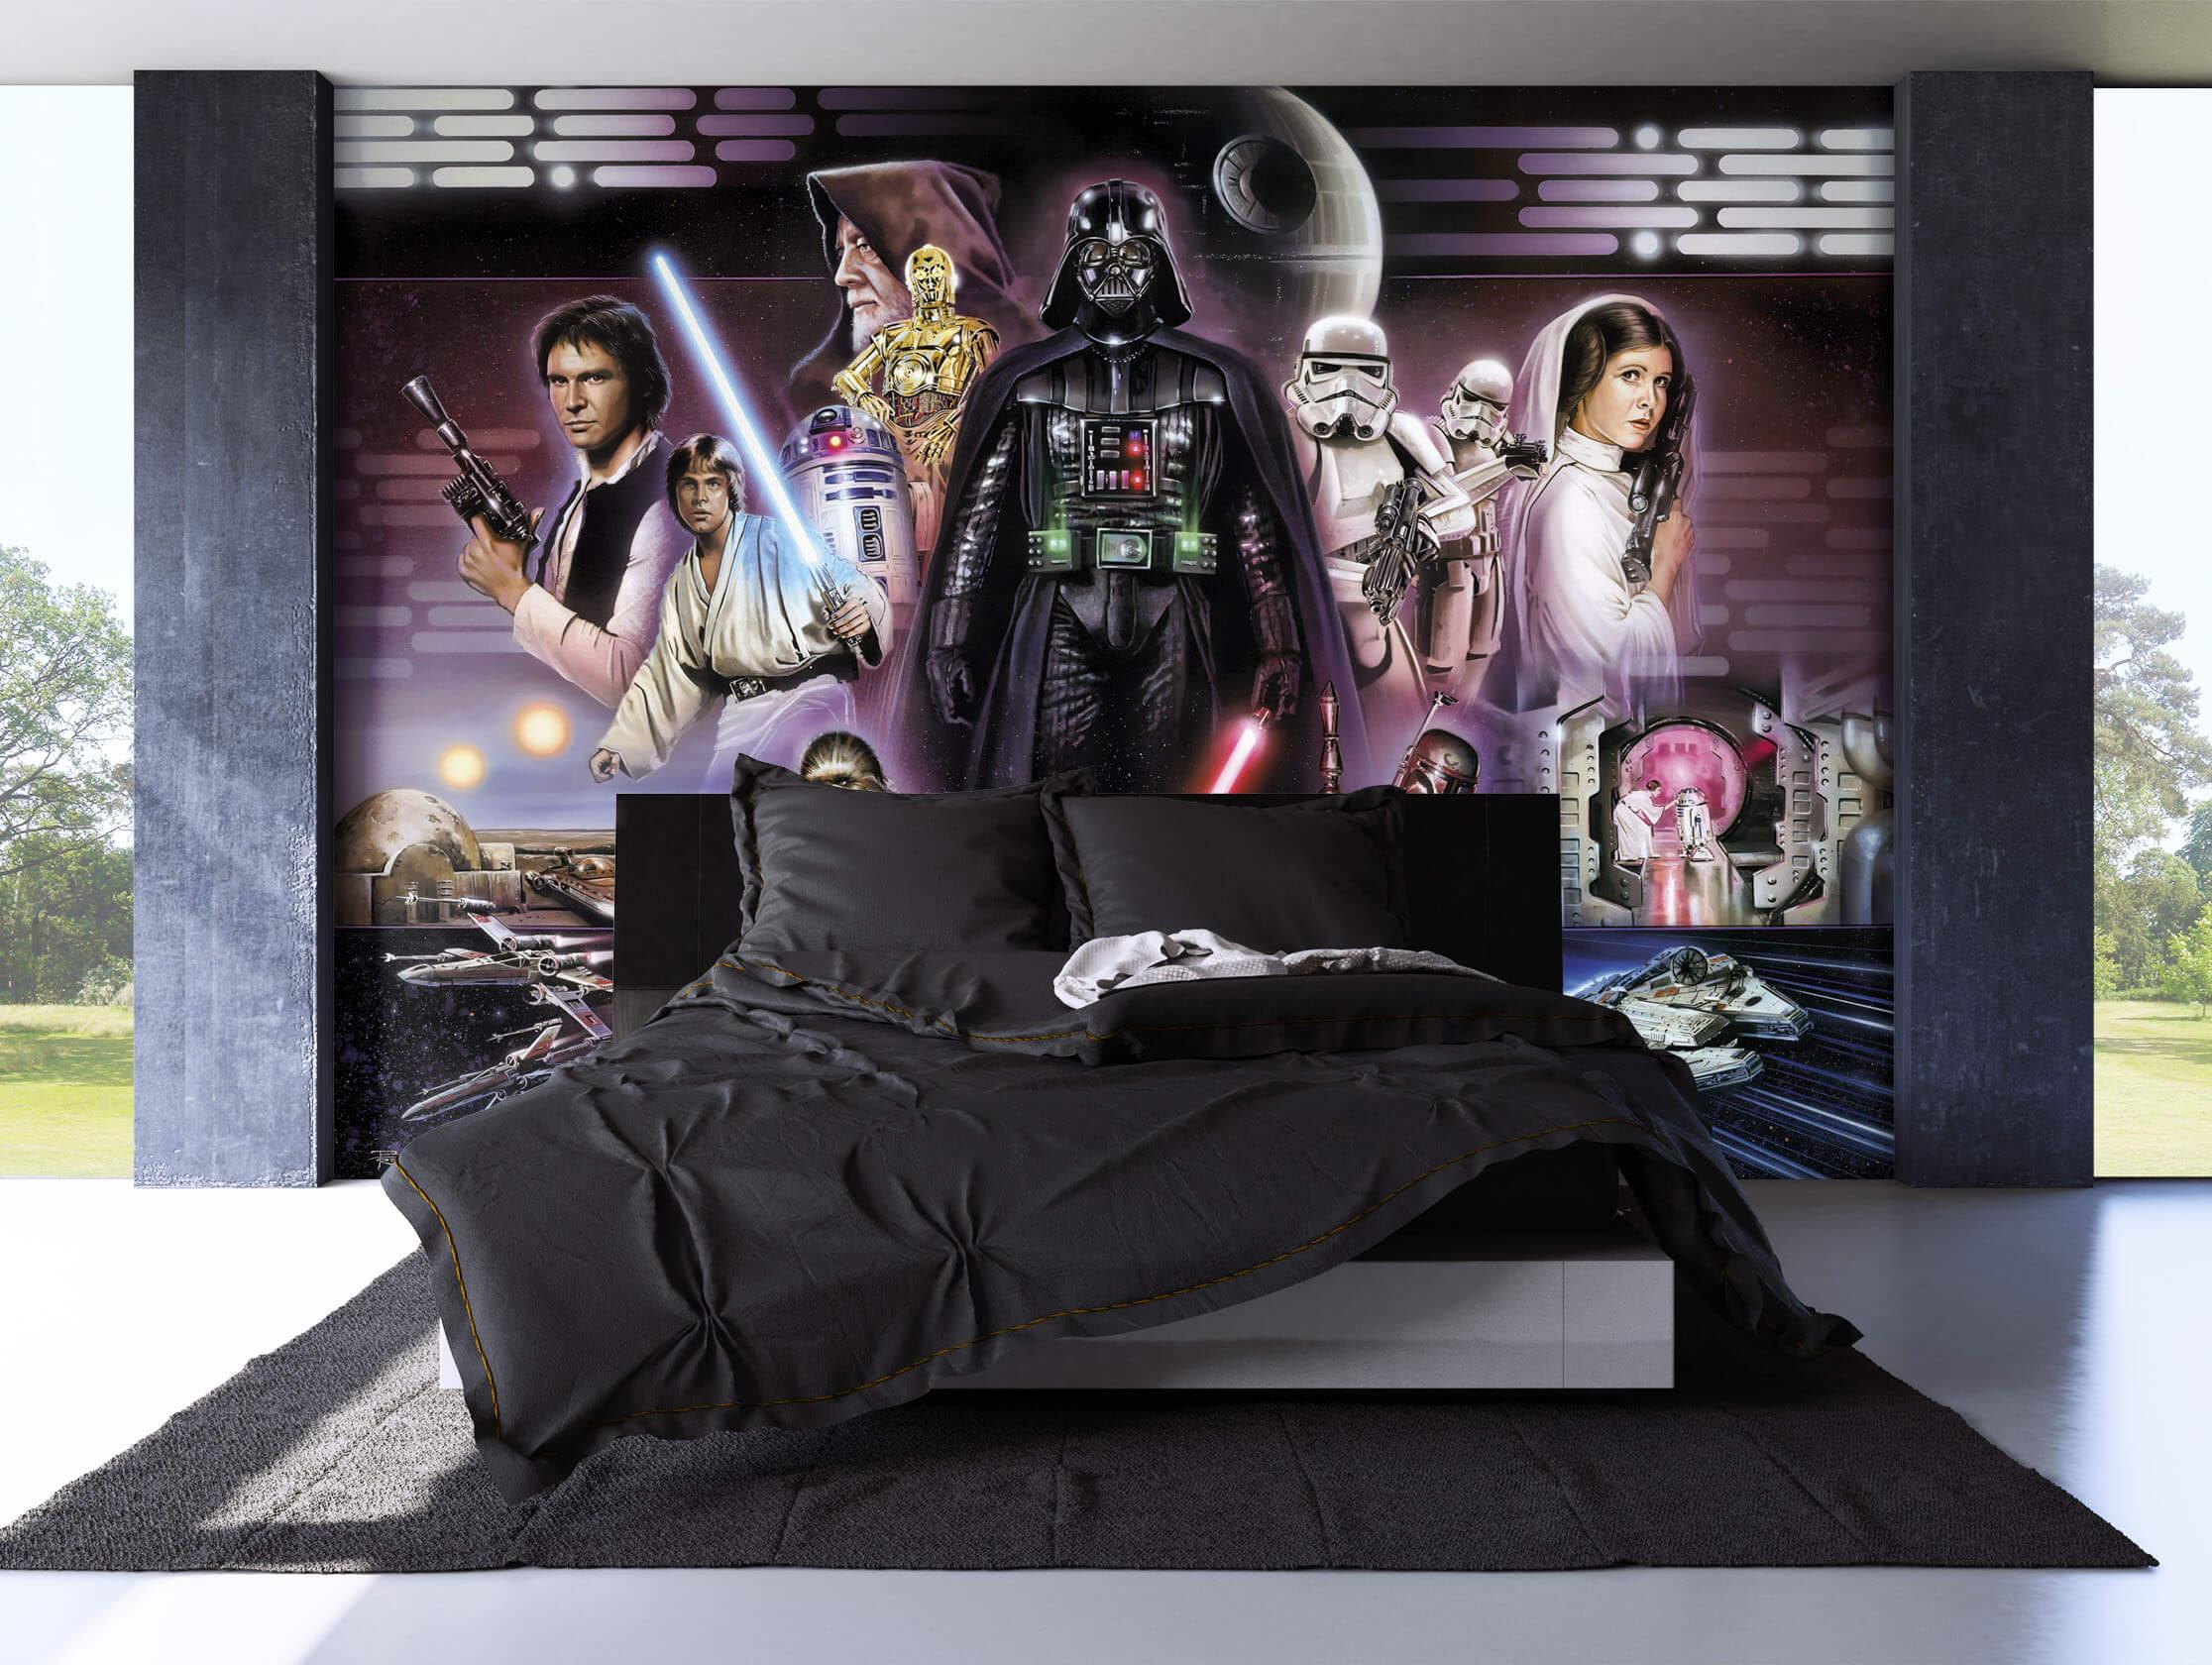 fototapete star wars disney darth vader 368x254 cm xxl wandbild poster kinder ebay. Black Bedroom Furniture Sets. Home Design Ideas